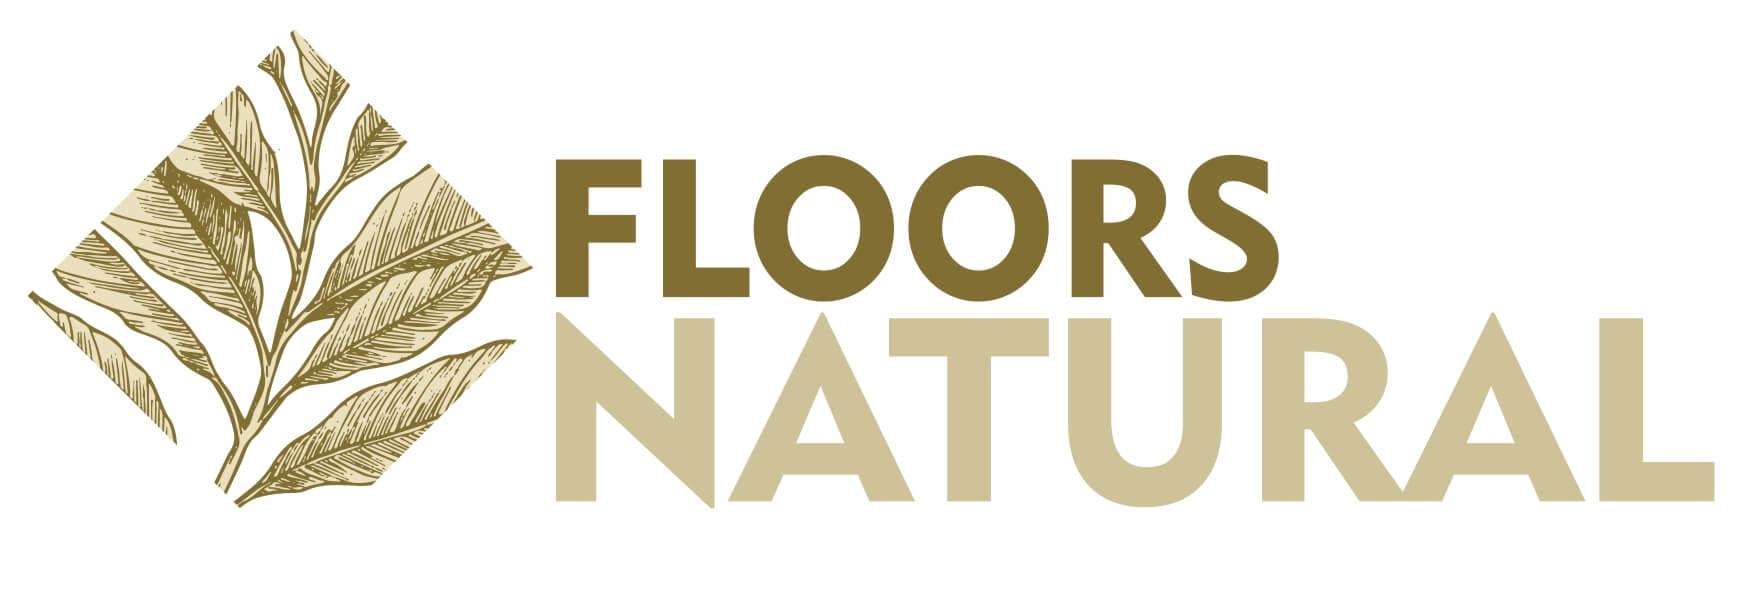 Floors Natural